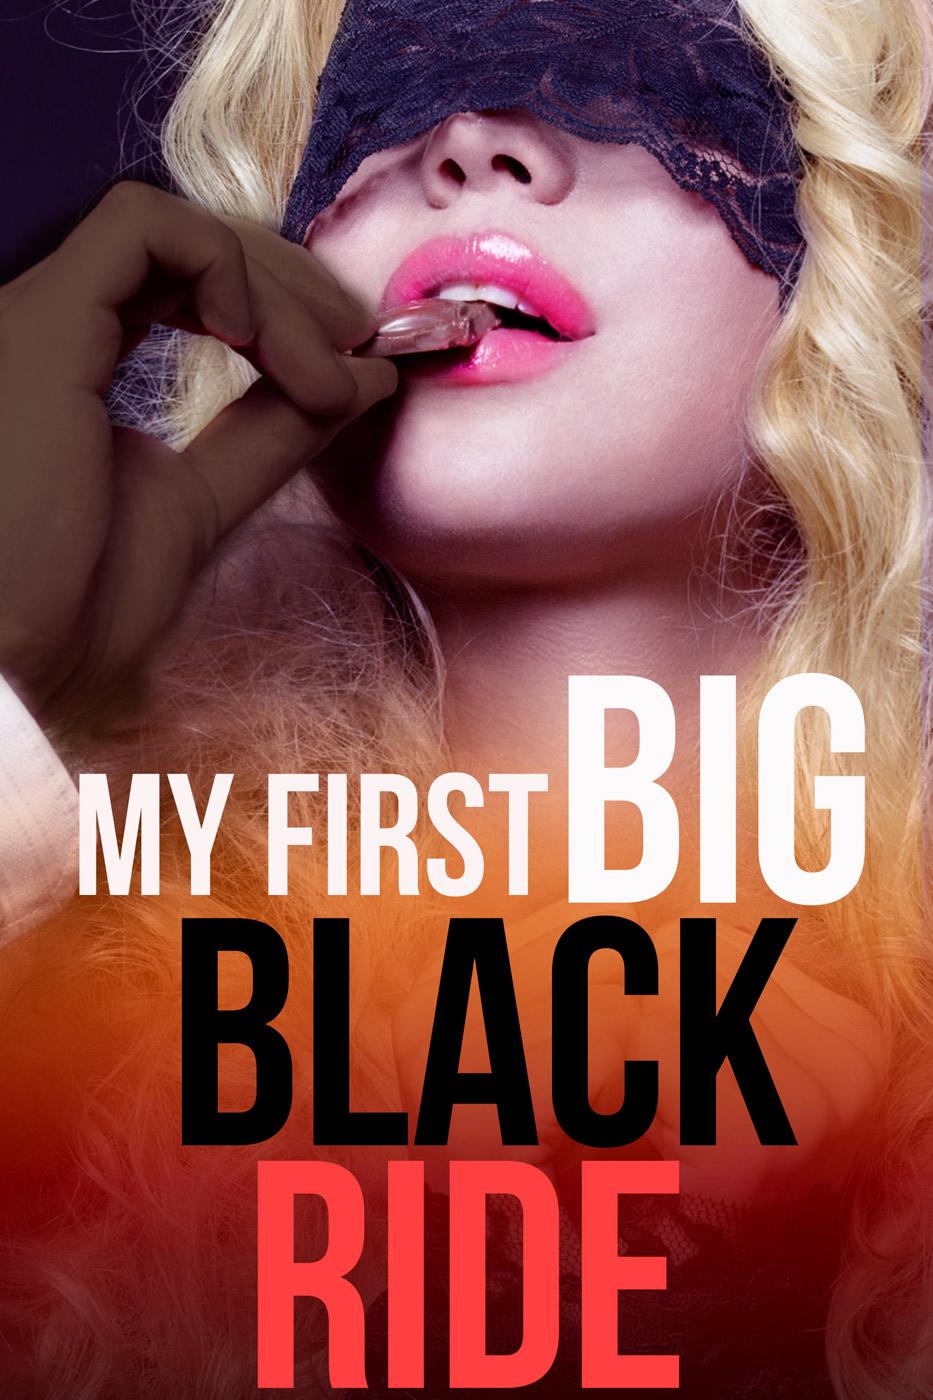 My first big black ride (an interracial babysitter erotica)